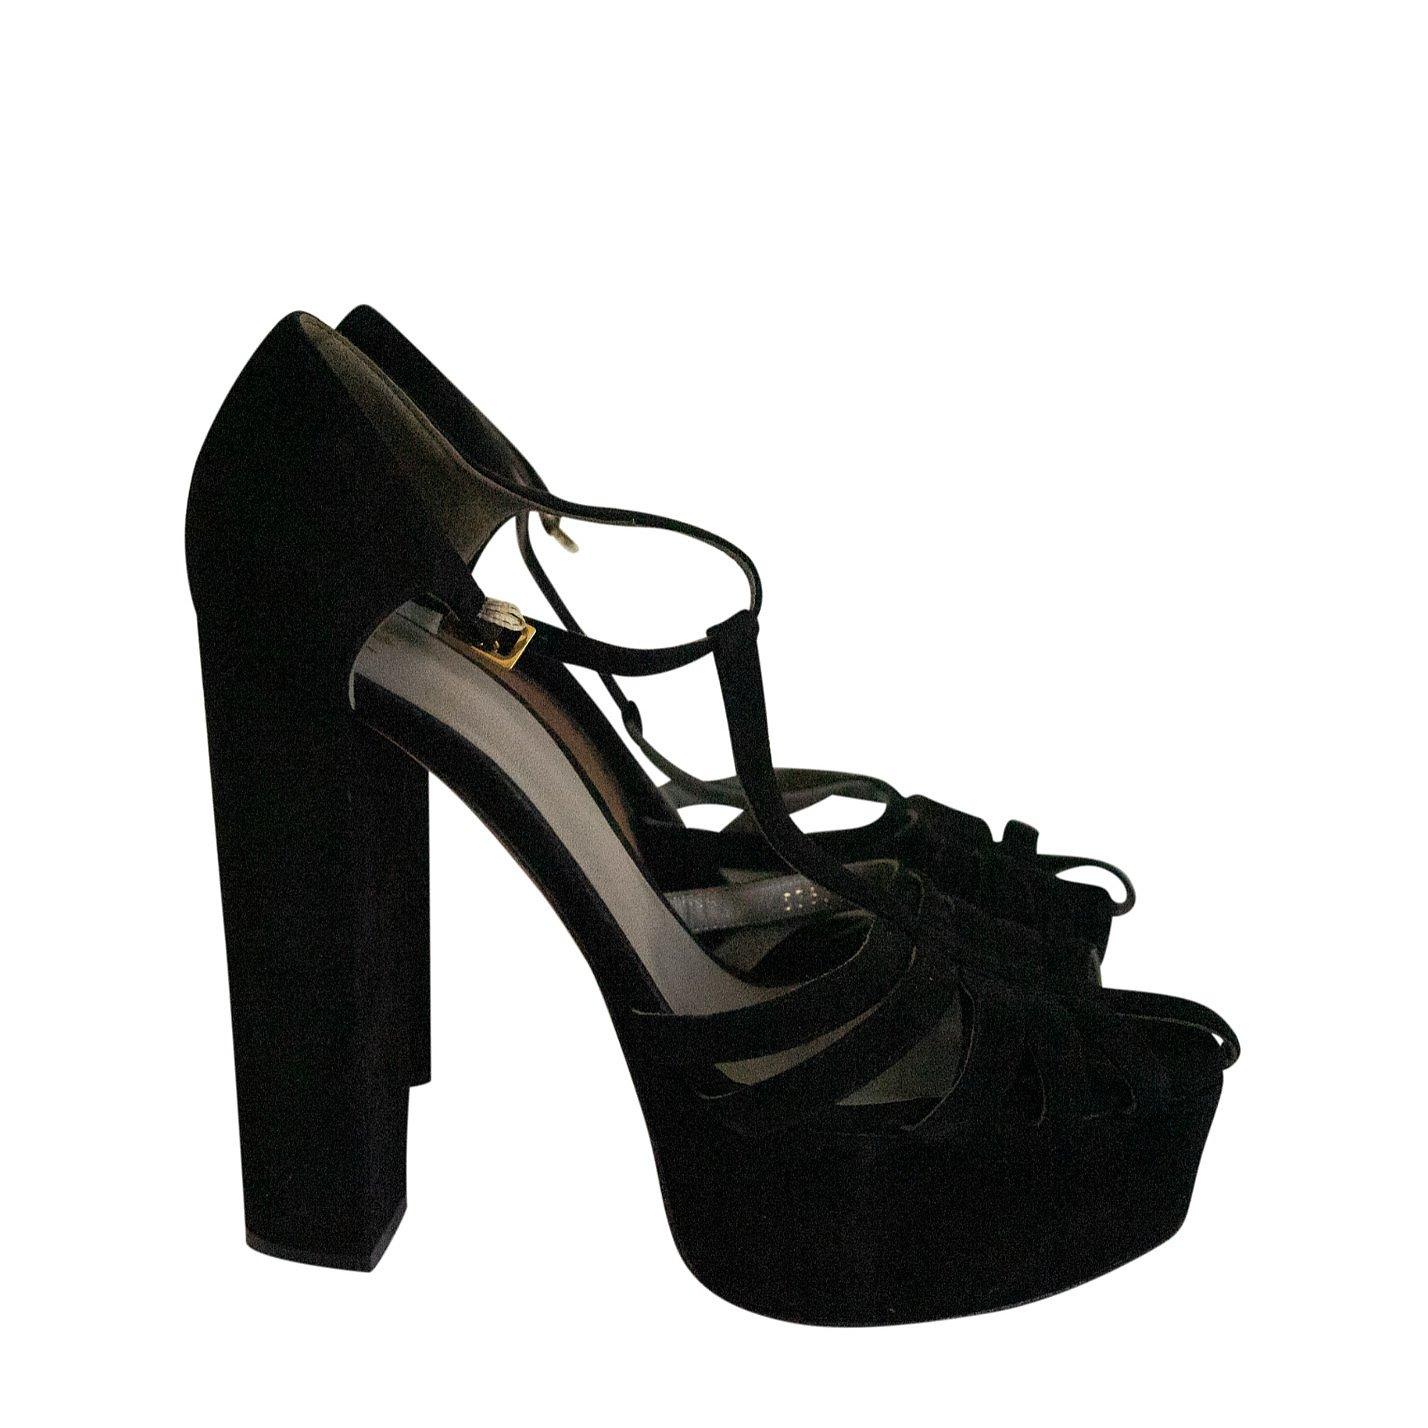 Gina Suede Platform Sandals